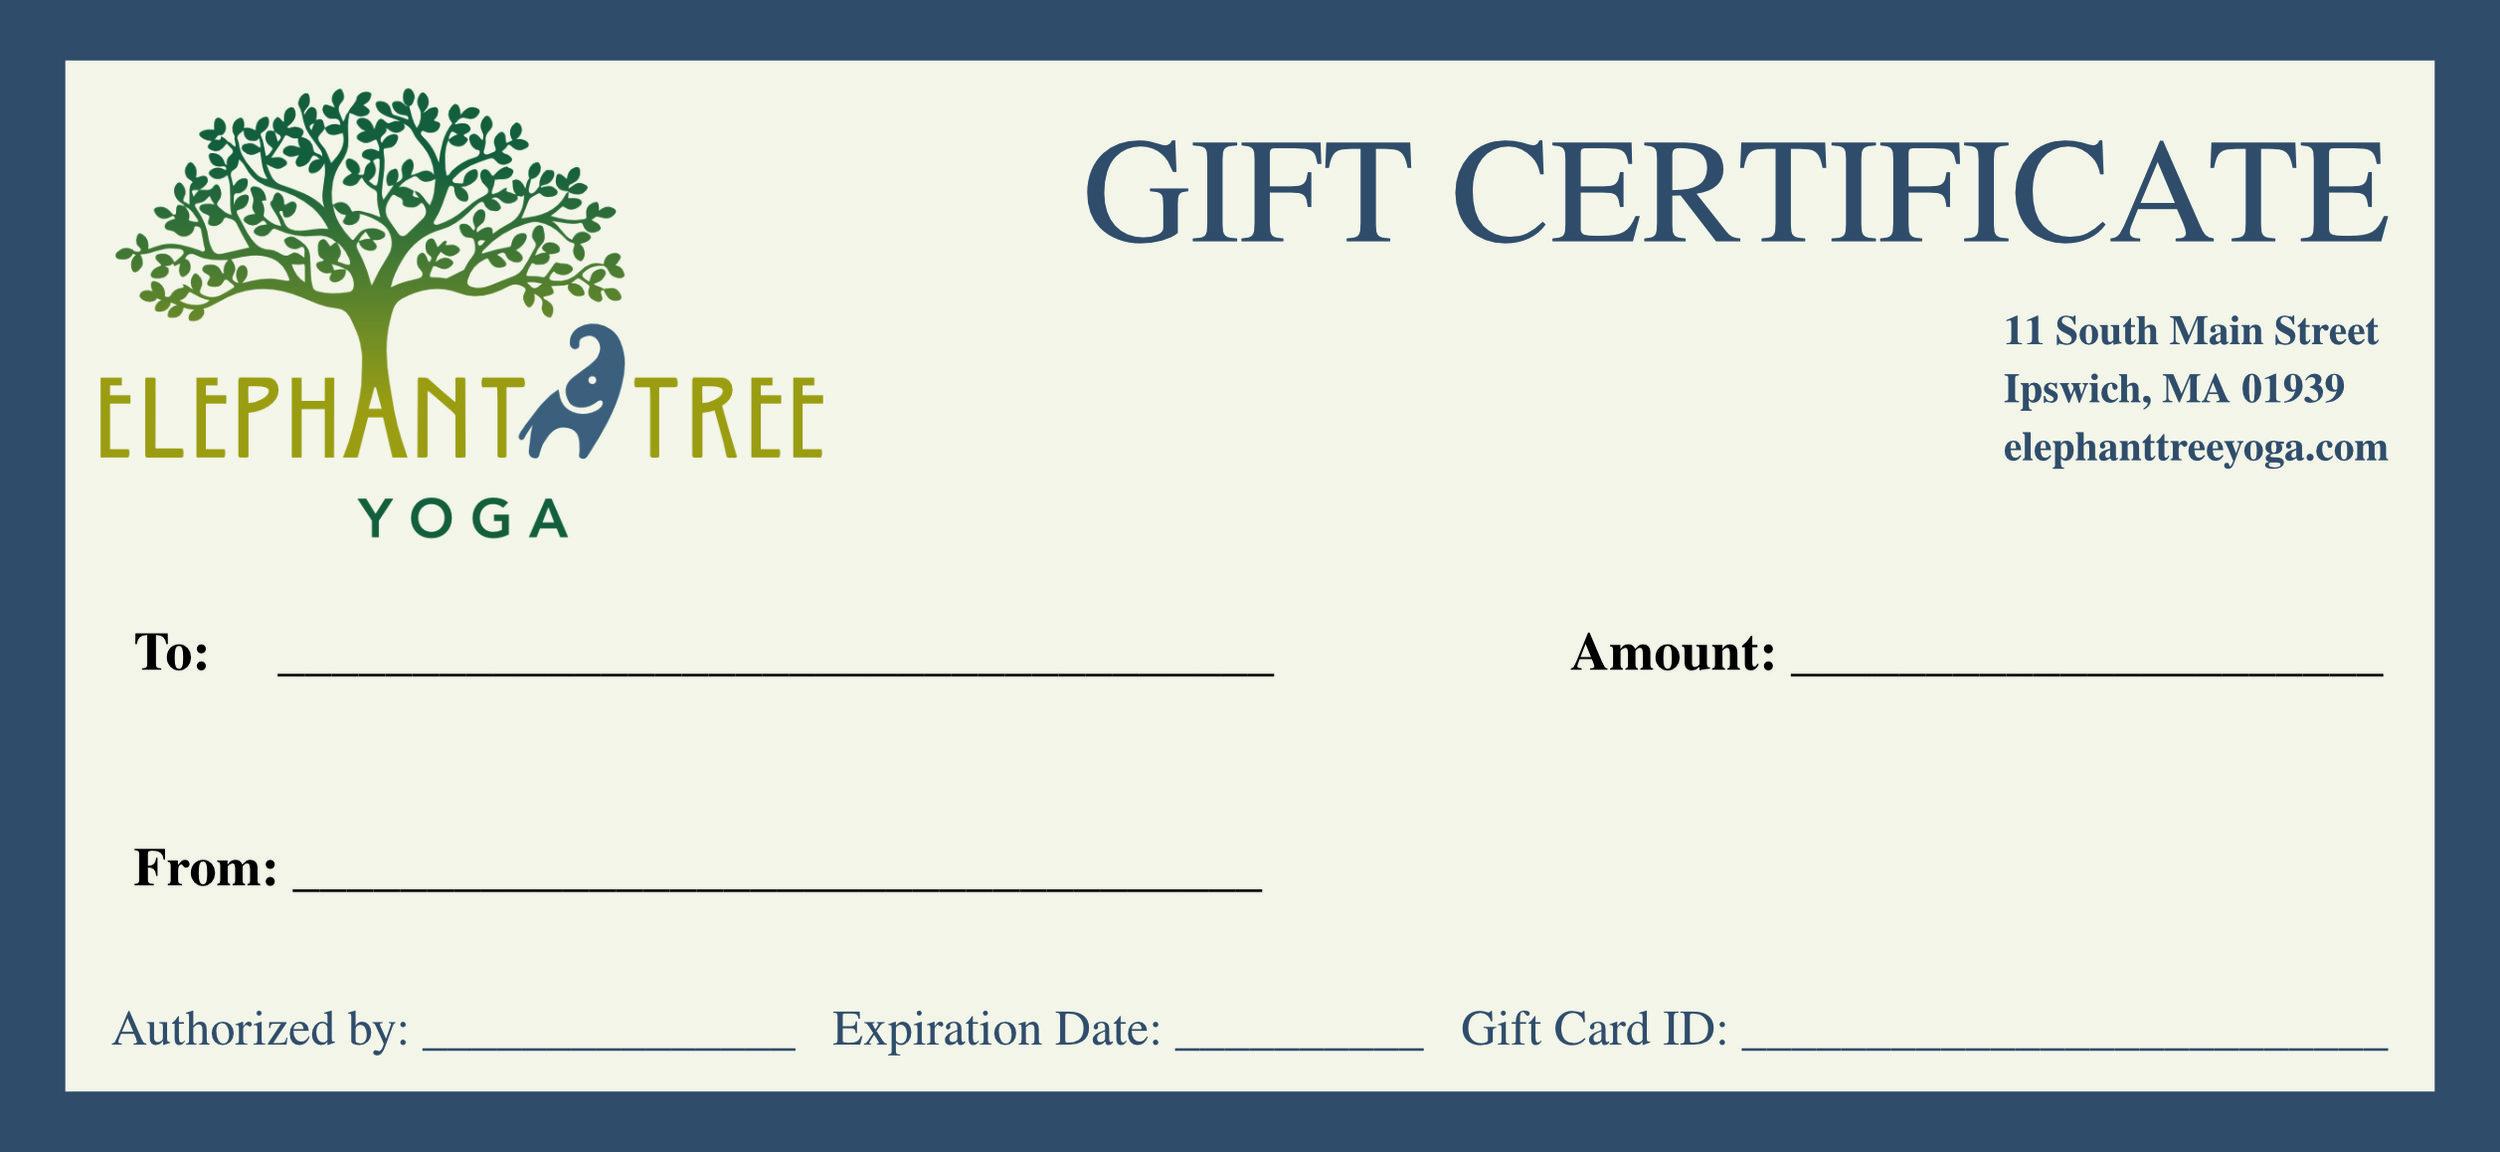 Gift Card Template.jpg